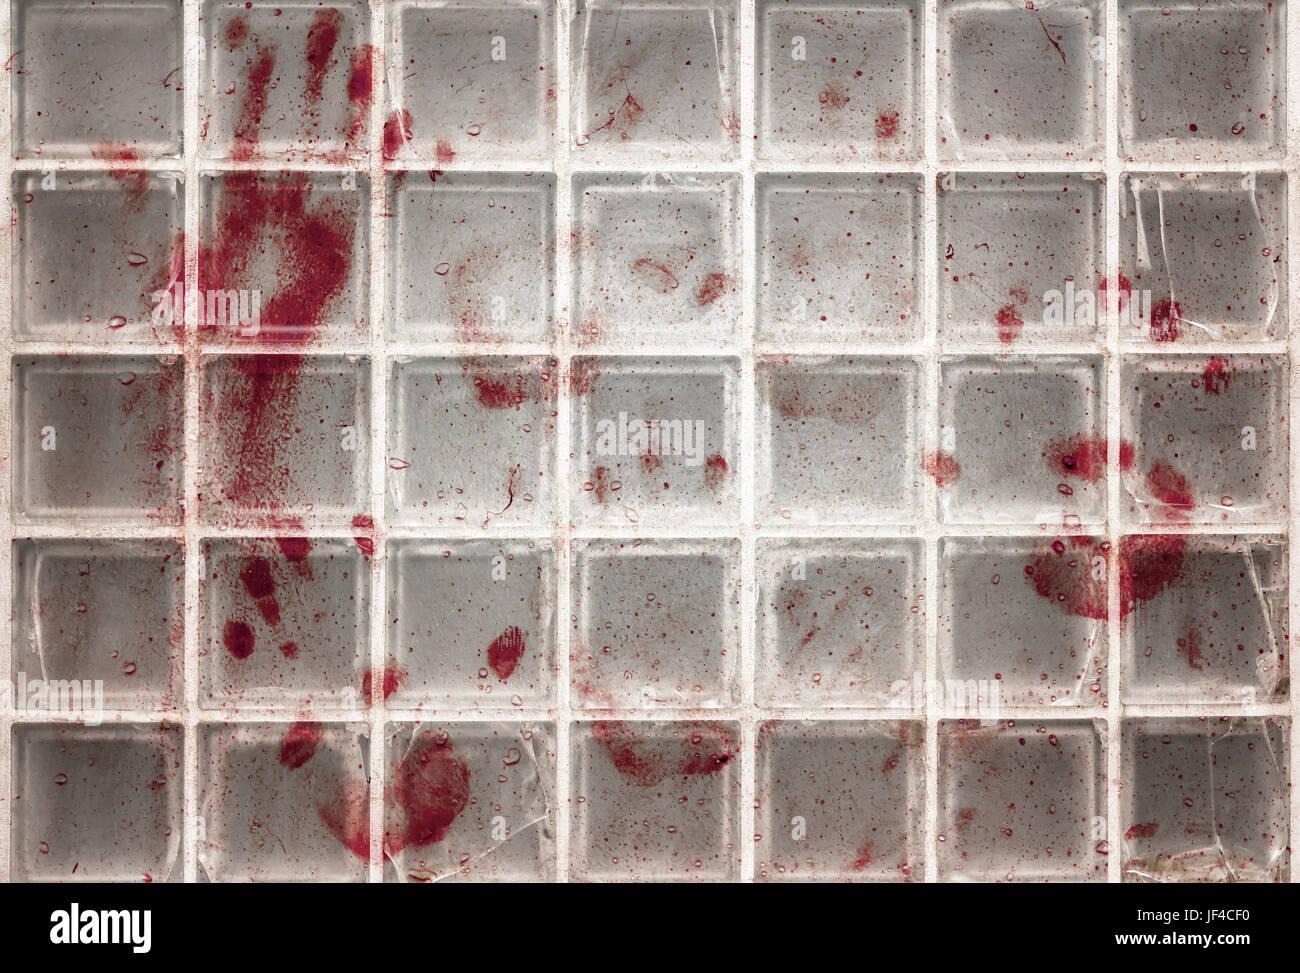 Bloody fingerprints on the glass - Stock Image